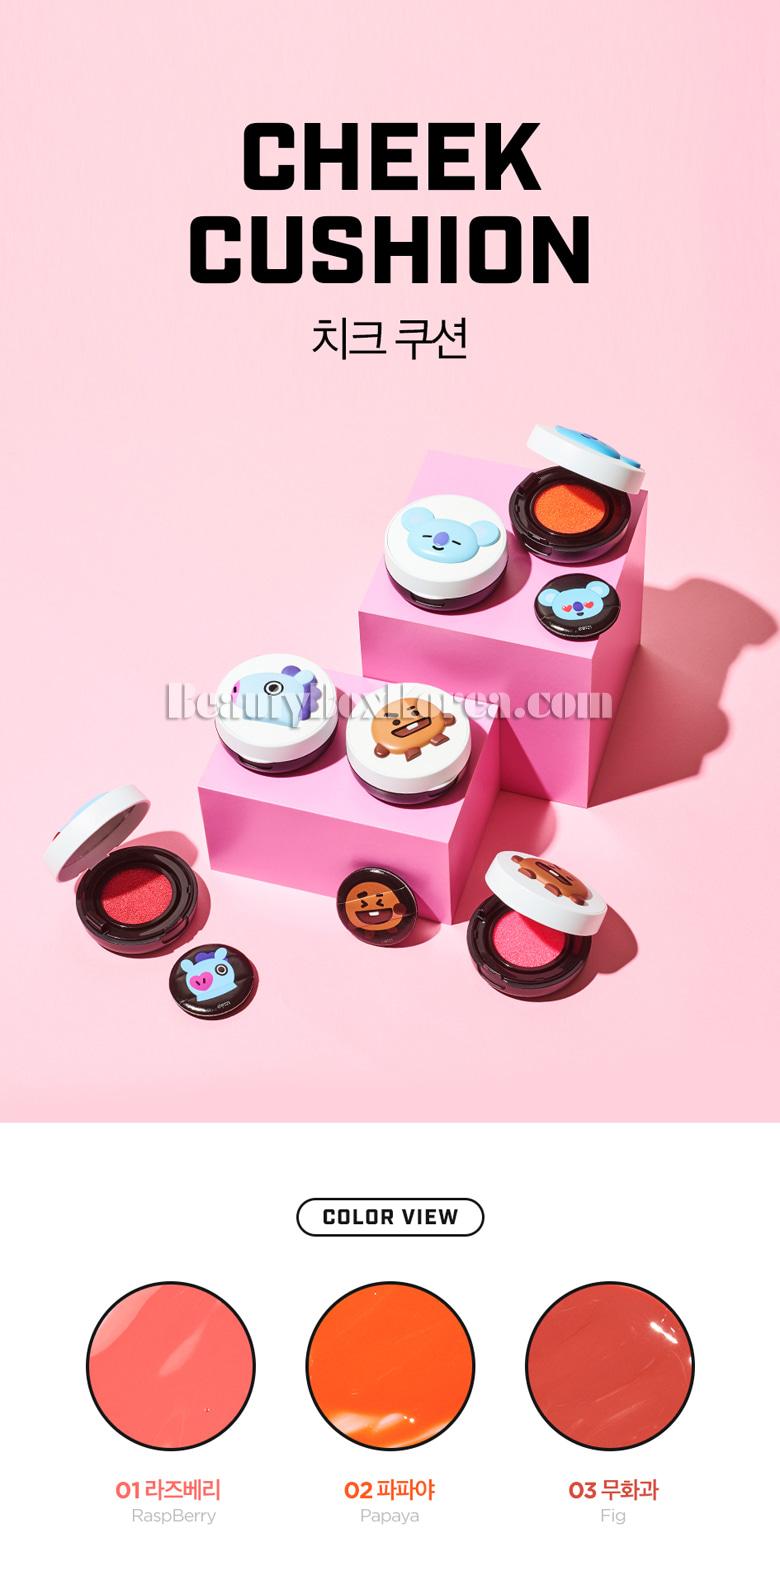 Beauty Box Korea - VT COSMETICS BT21 Cheek Cushion 6g[VTxBT21